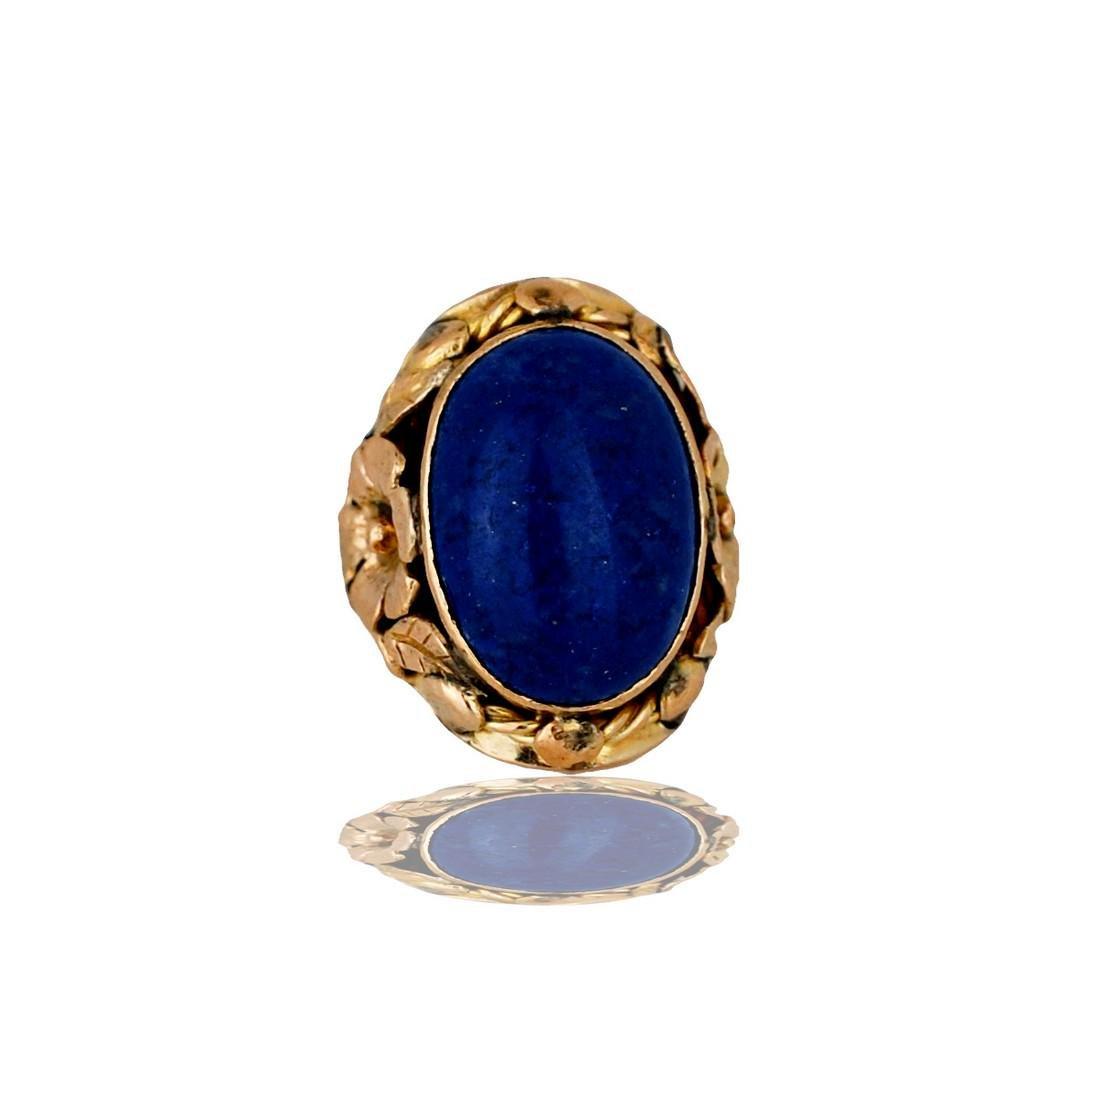 14 Karat Lapis Lazuli, Handmade Floral Petal Cabochon